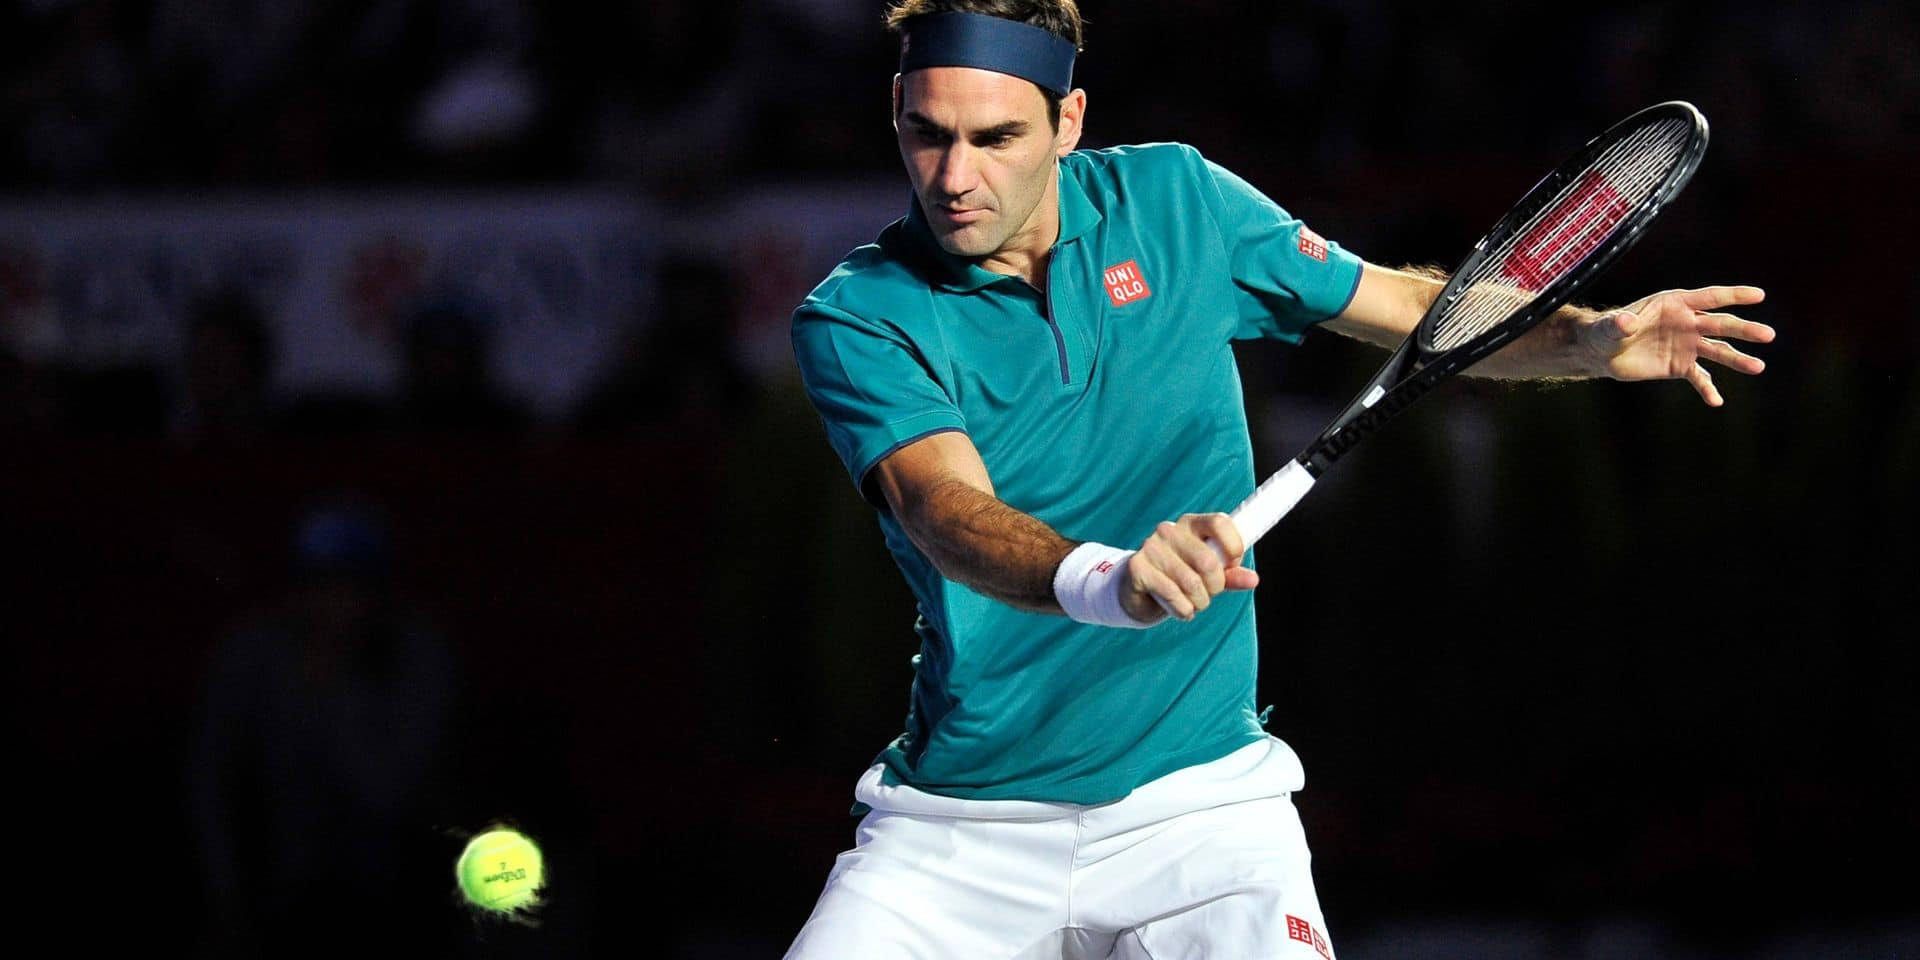 Non, Federer n'a pas dit son dernier mot